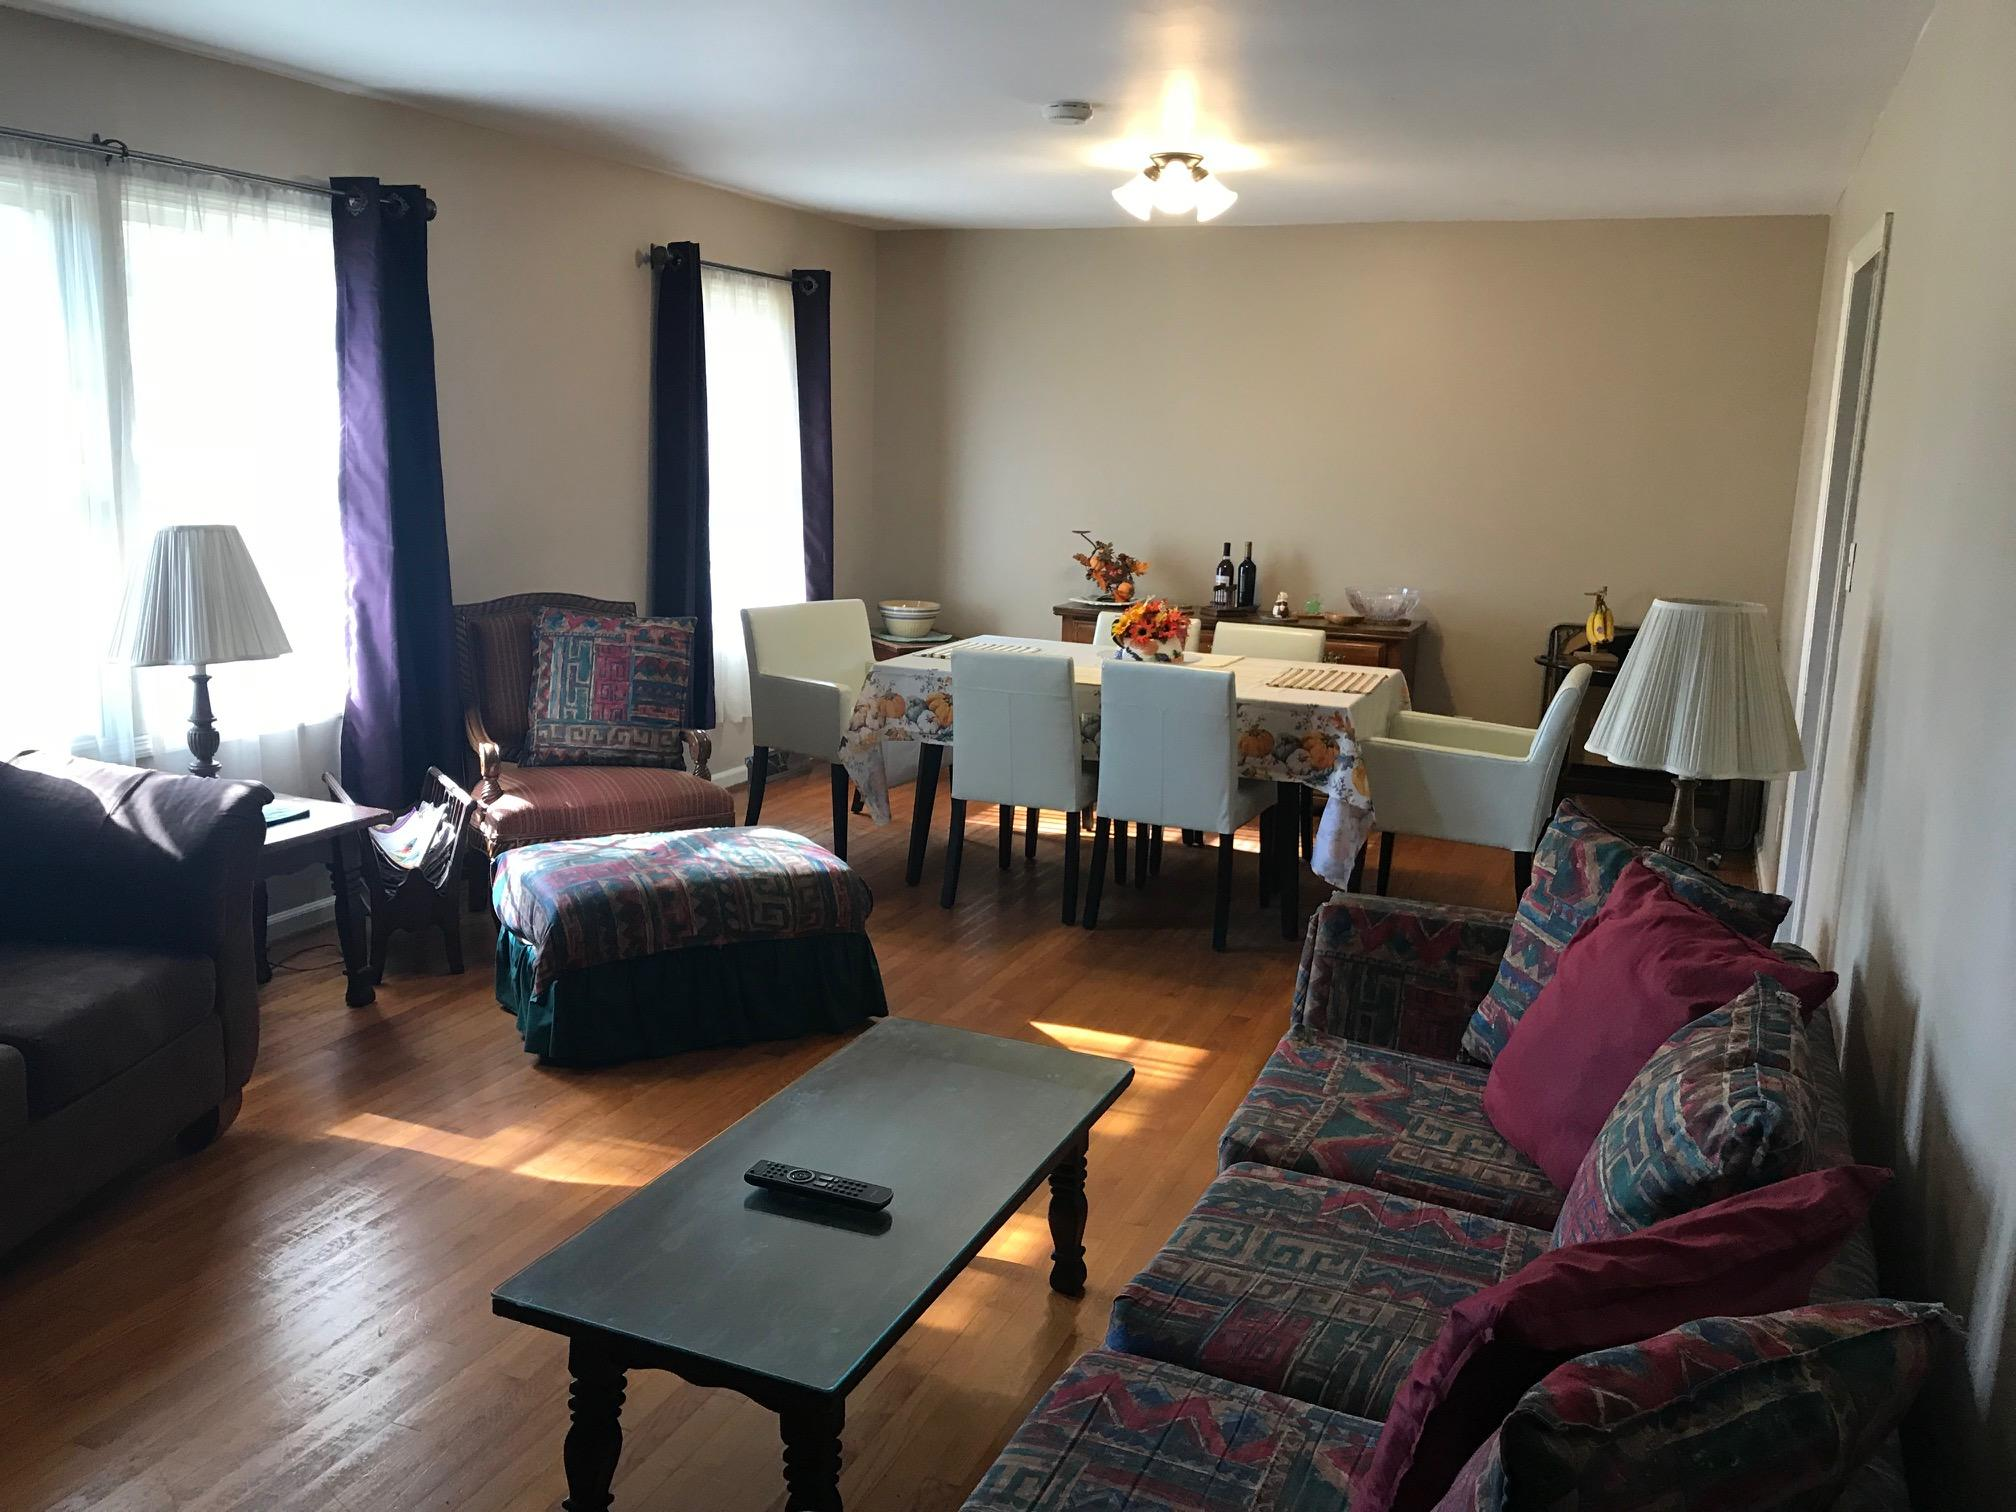 Northbridge Terrace Homes For Sale - 1079 Orange Grove, Charleston, SC - 24